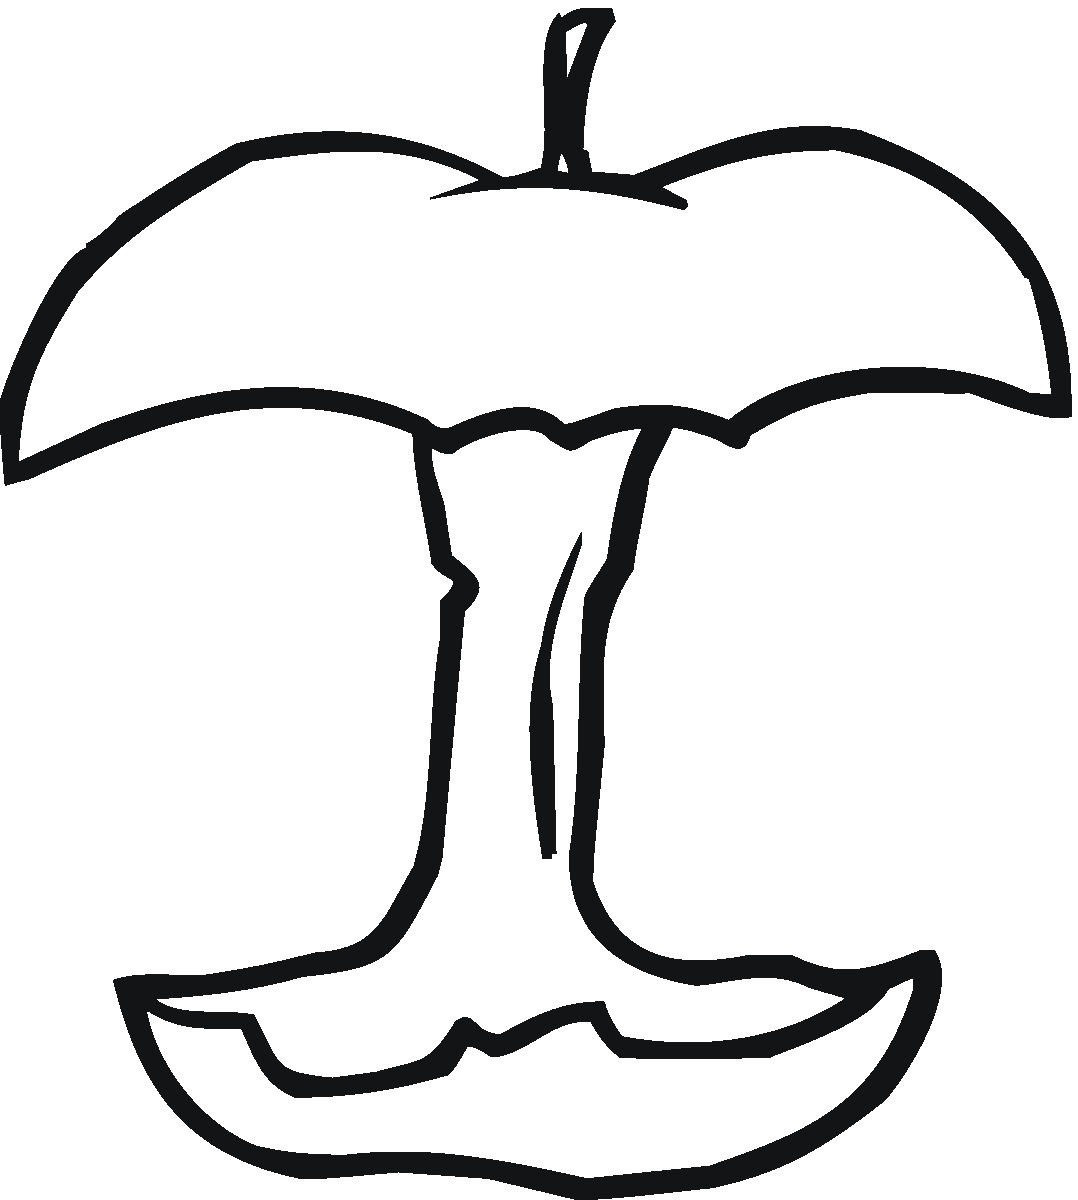 Lujoso Hojas Para Colorear De Manzana Composición - Dibujos Para ...